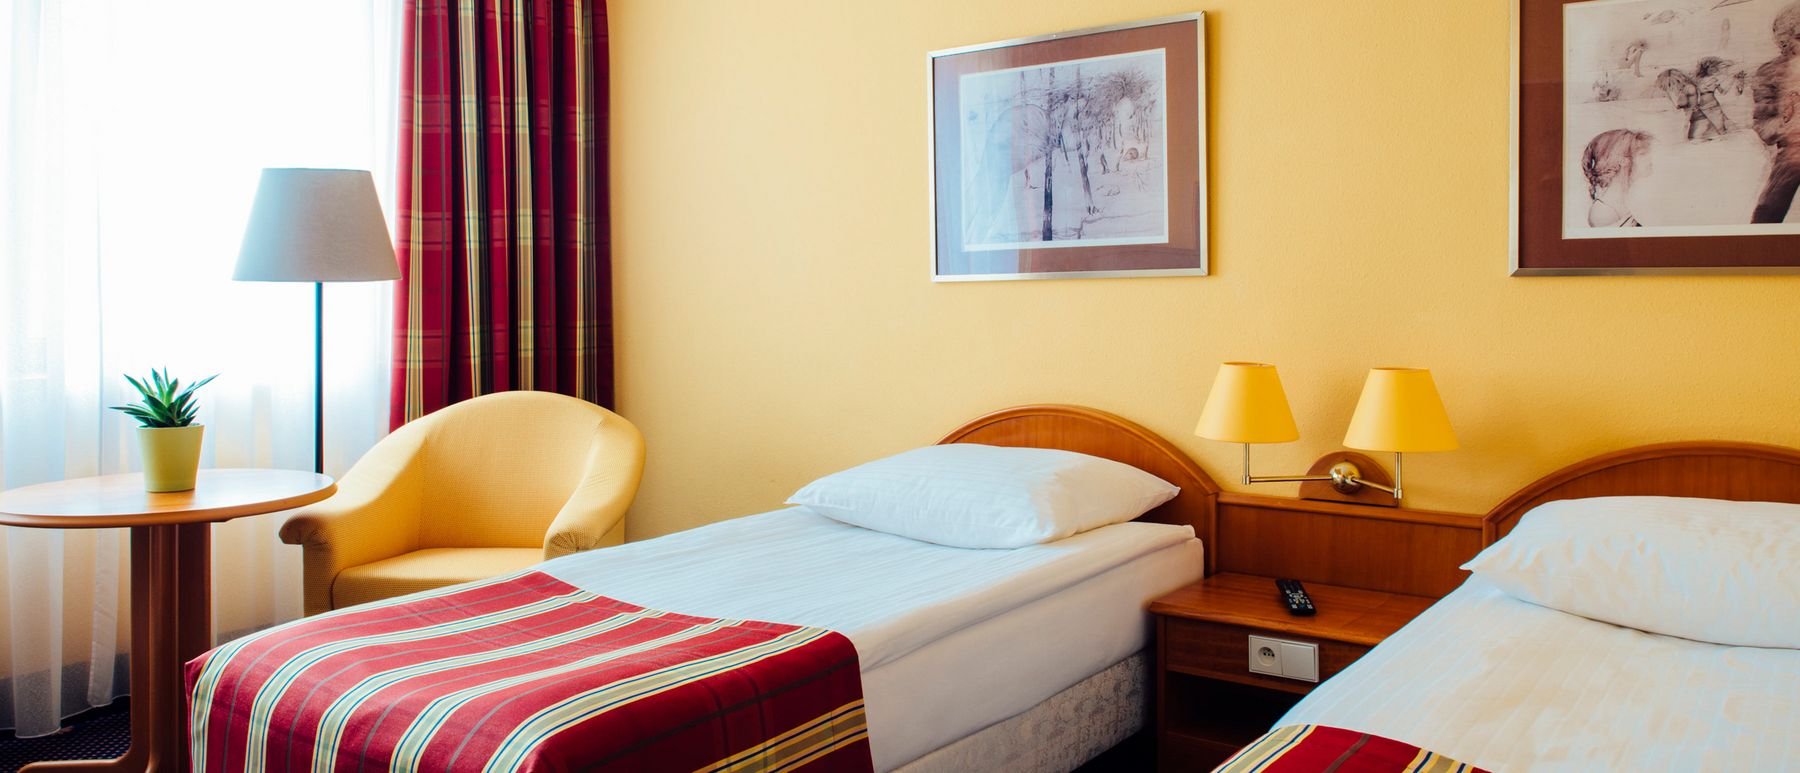 HotelVienna House Diplomat Praha